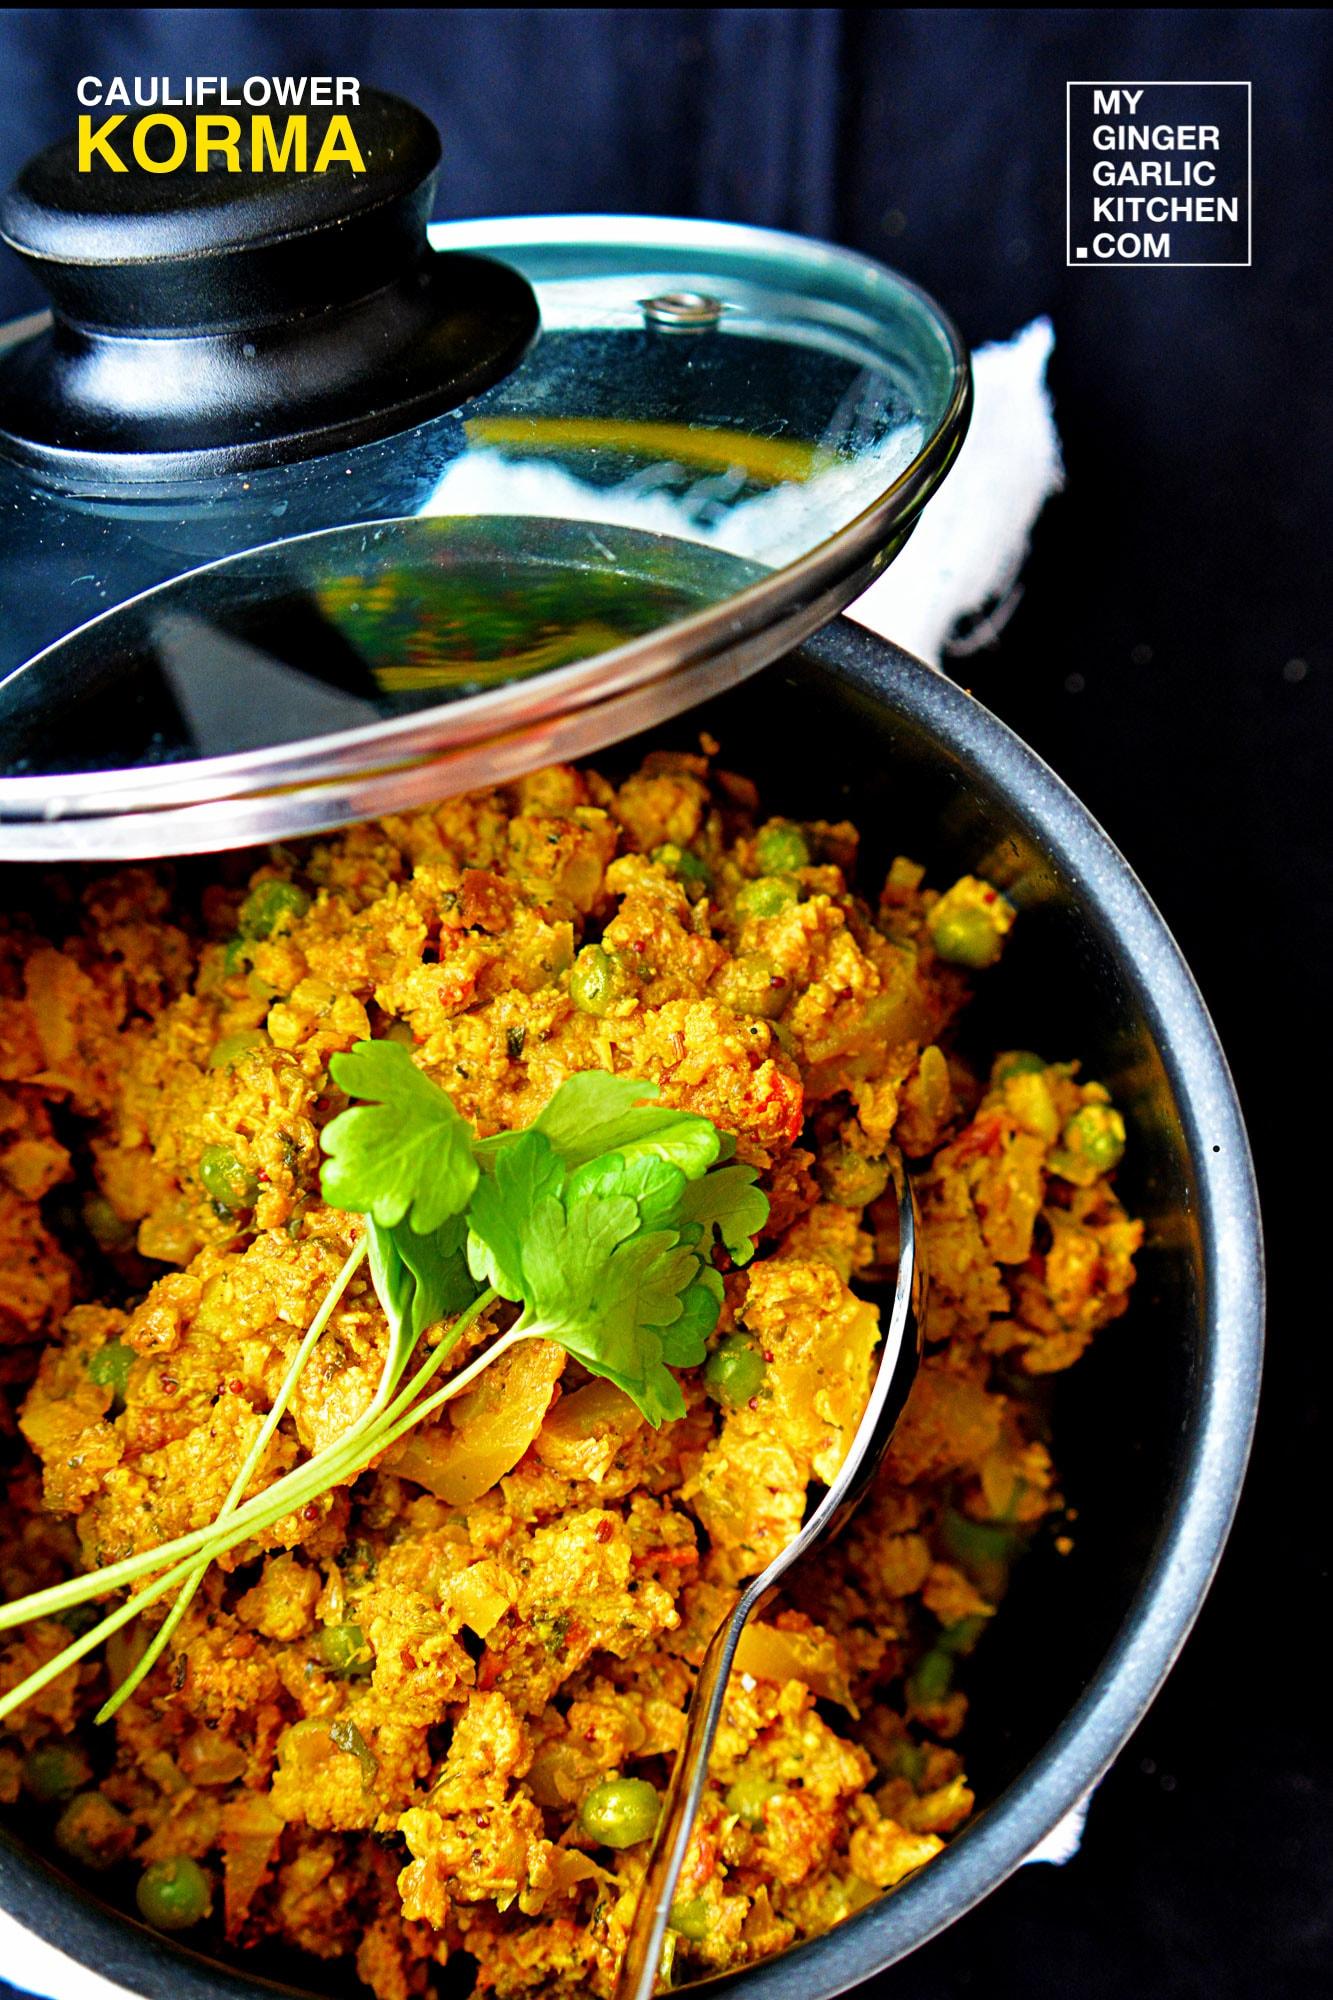 recipe-tantalizing-cauliflower-korma-anupama-paliwal-my-ginger-garlic-kitchen-2